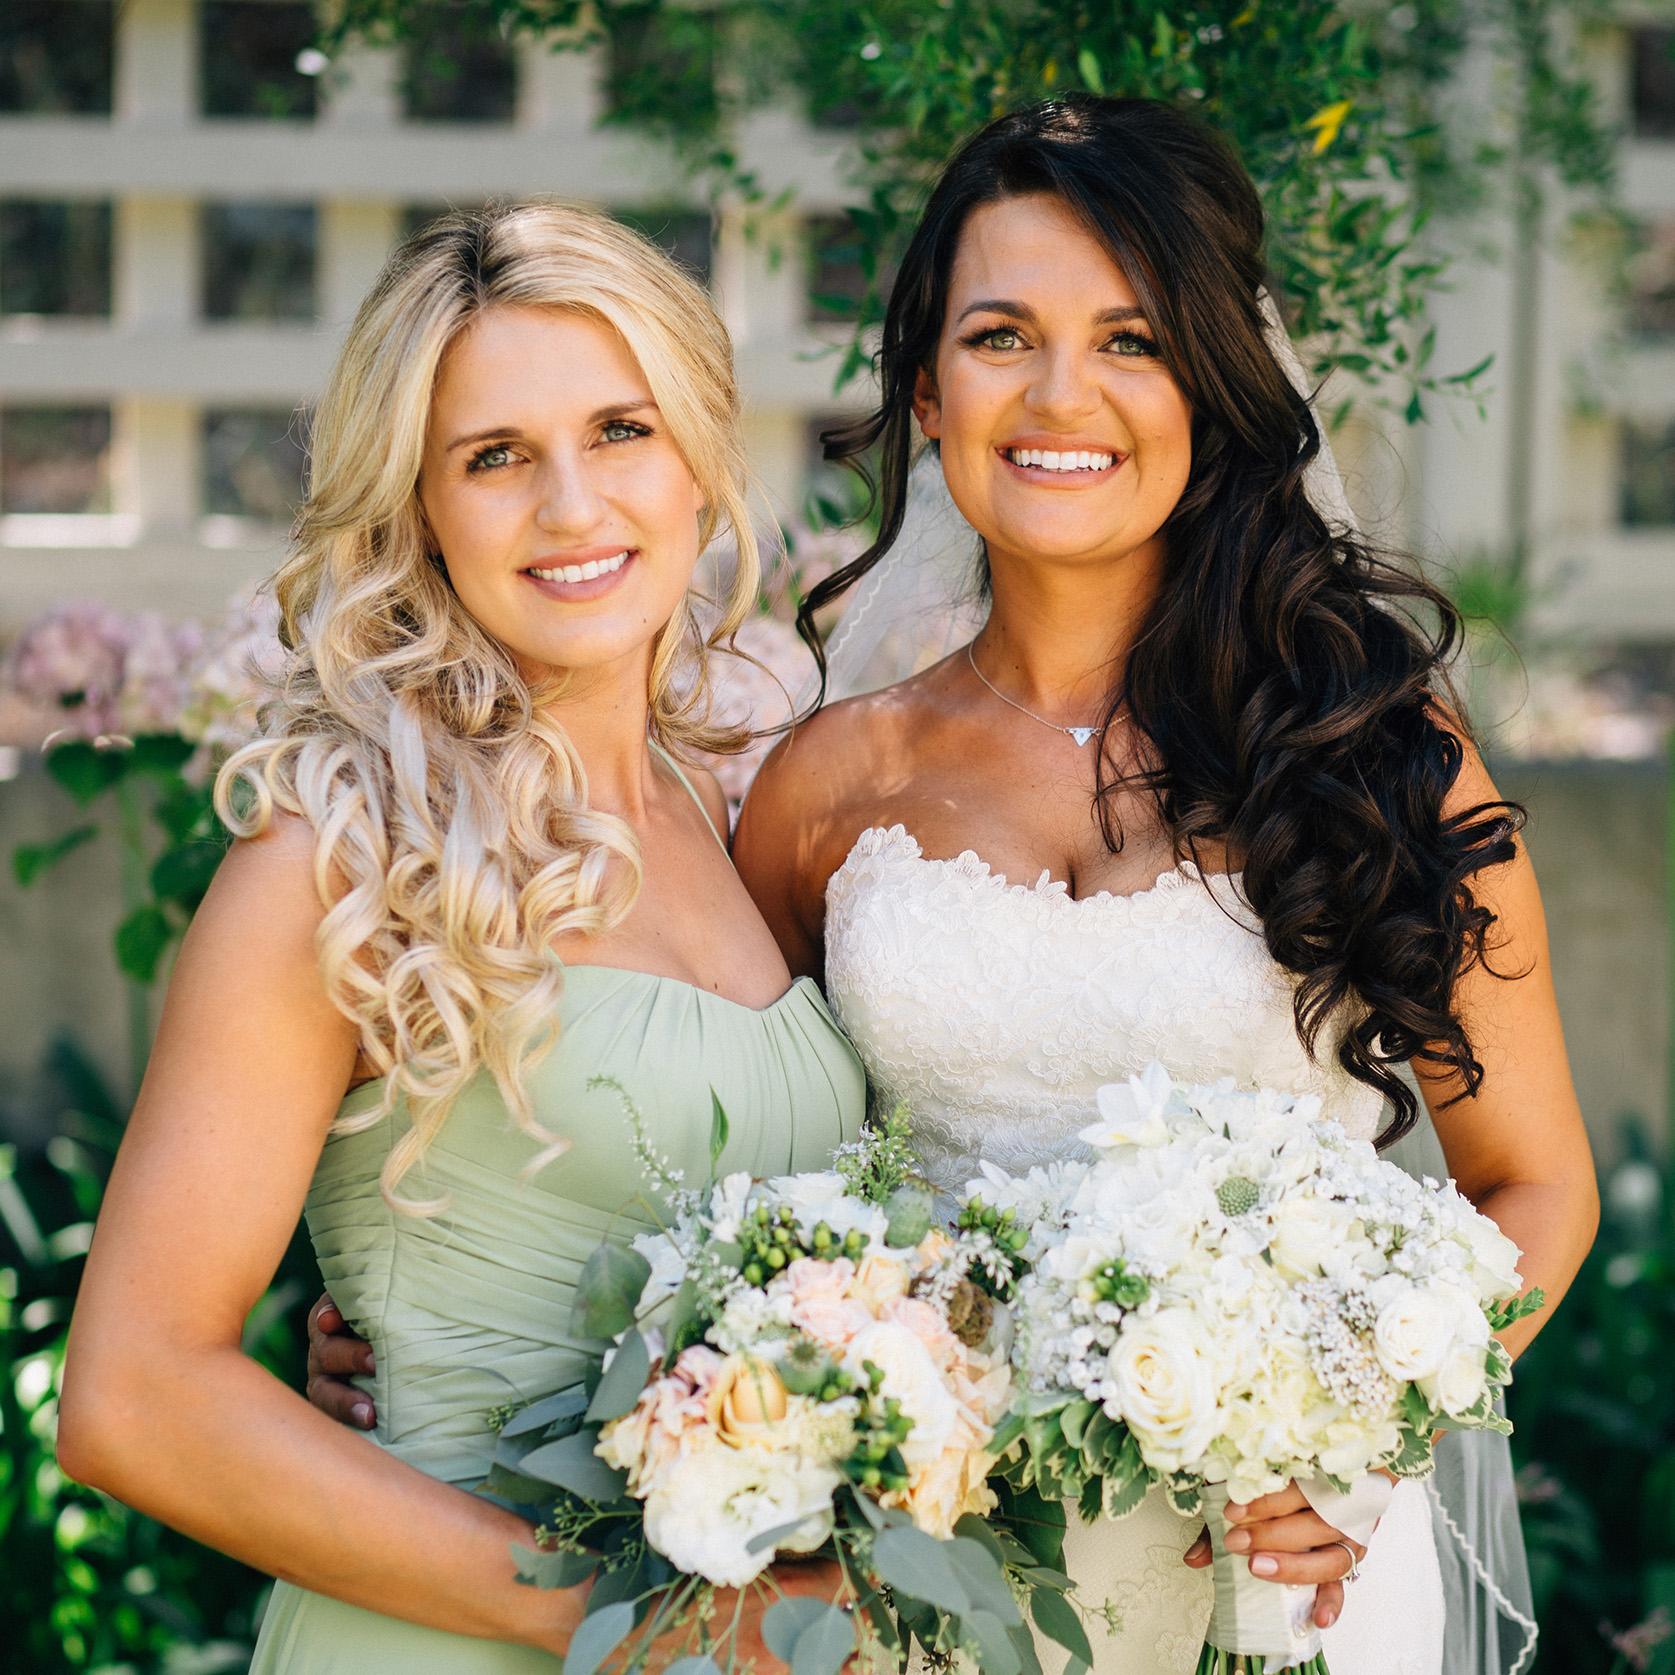 bride and bridesmaid square.jpg